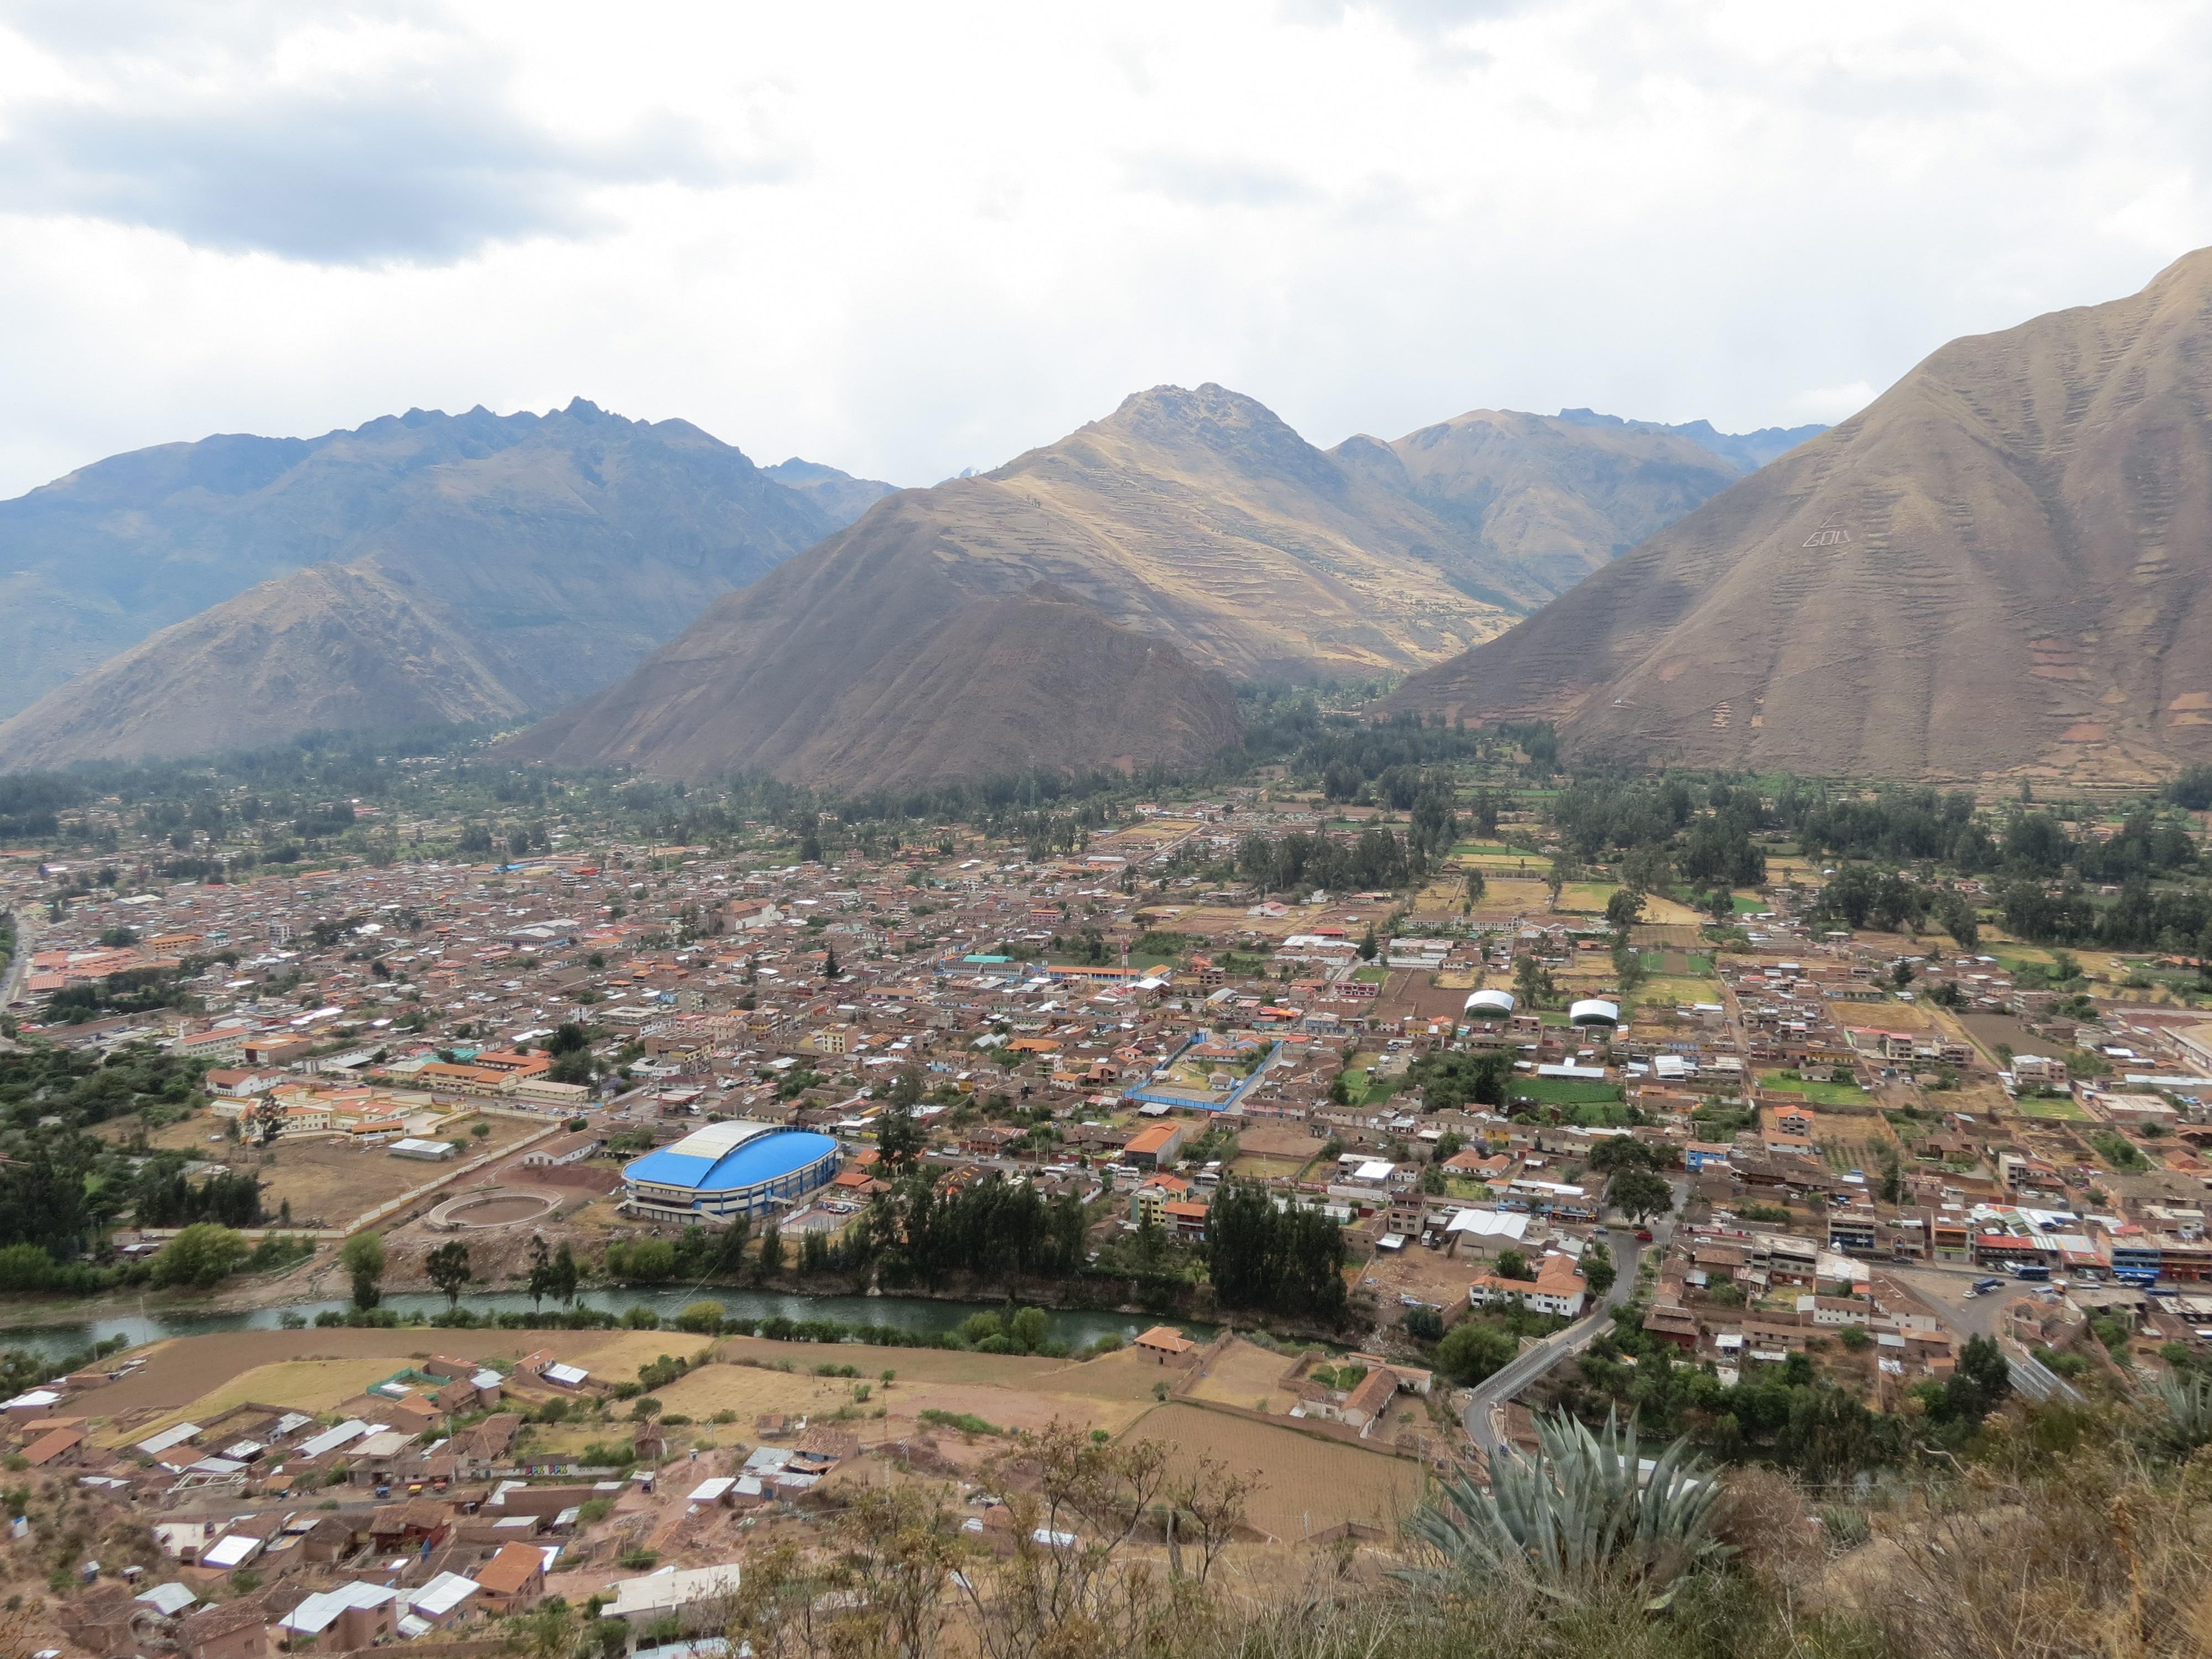 Day 5 - Machu Picchu back to Cusco